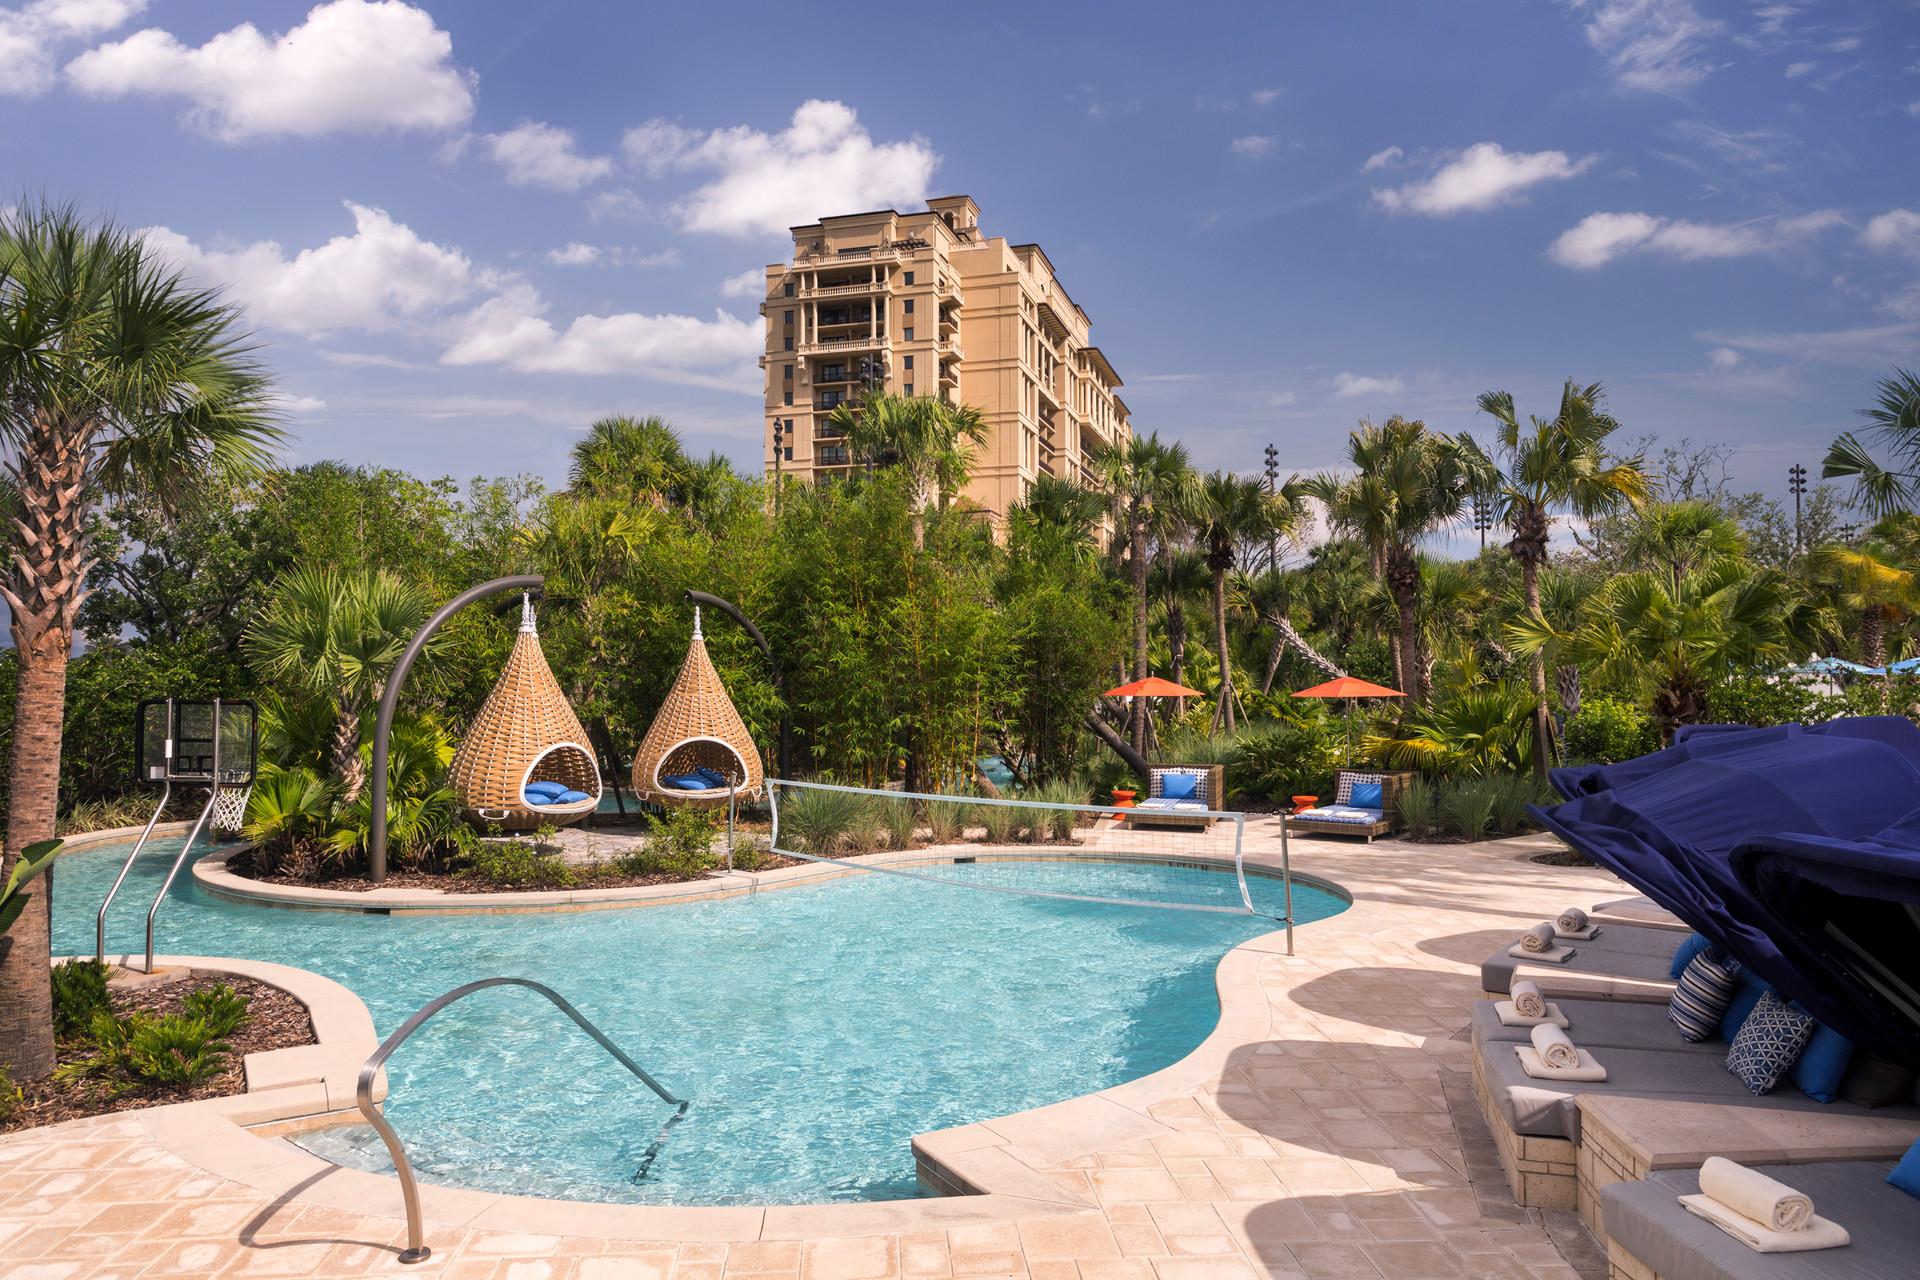 Four Seasons Orlando at Walt Disney World Resorts